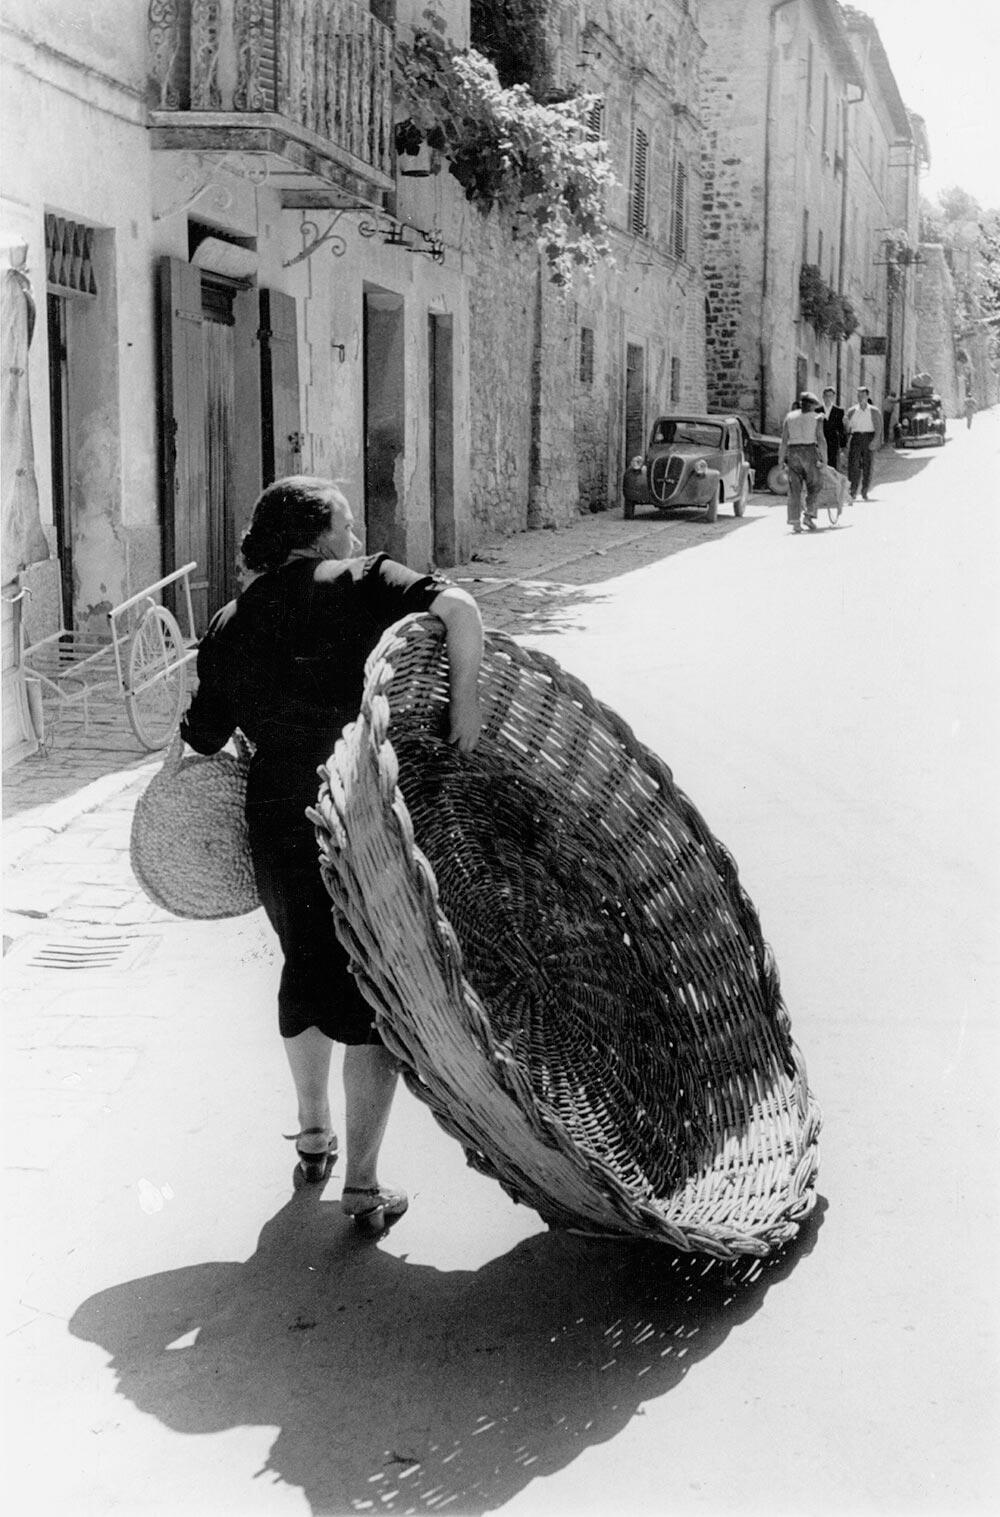 Giant Basket fine art photography